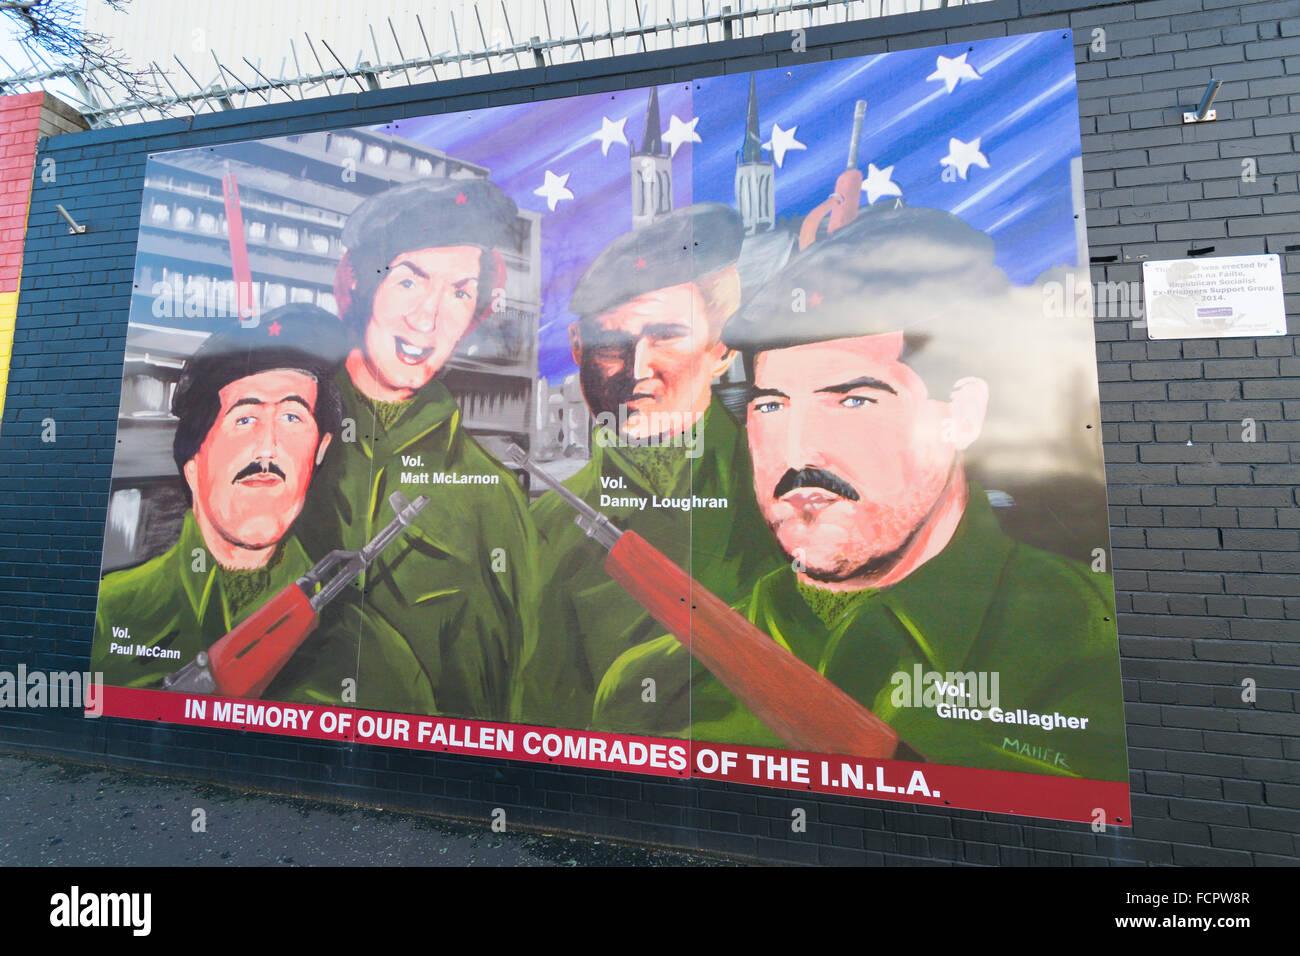 INLA mural in memory of their fallen comrades at international wall at Belfast Falls Road. - Stock Image